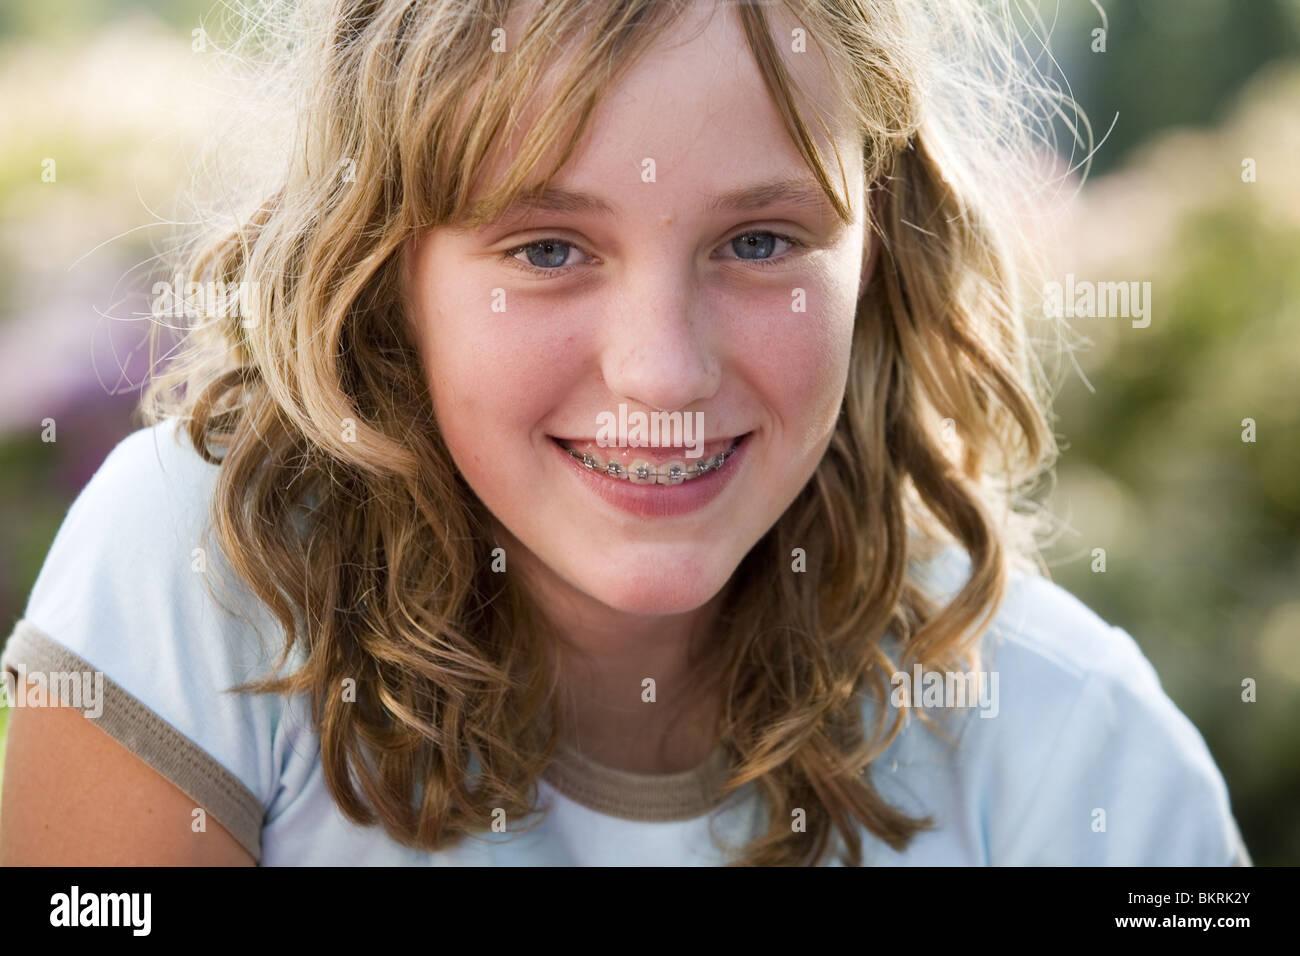 Teen Smiles 105